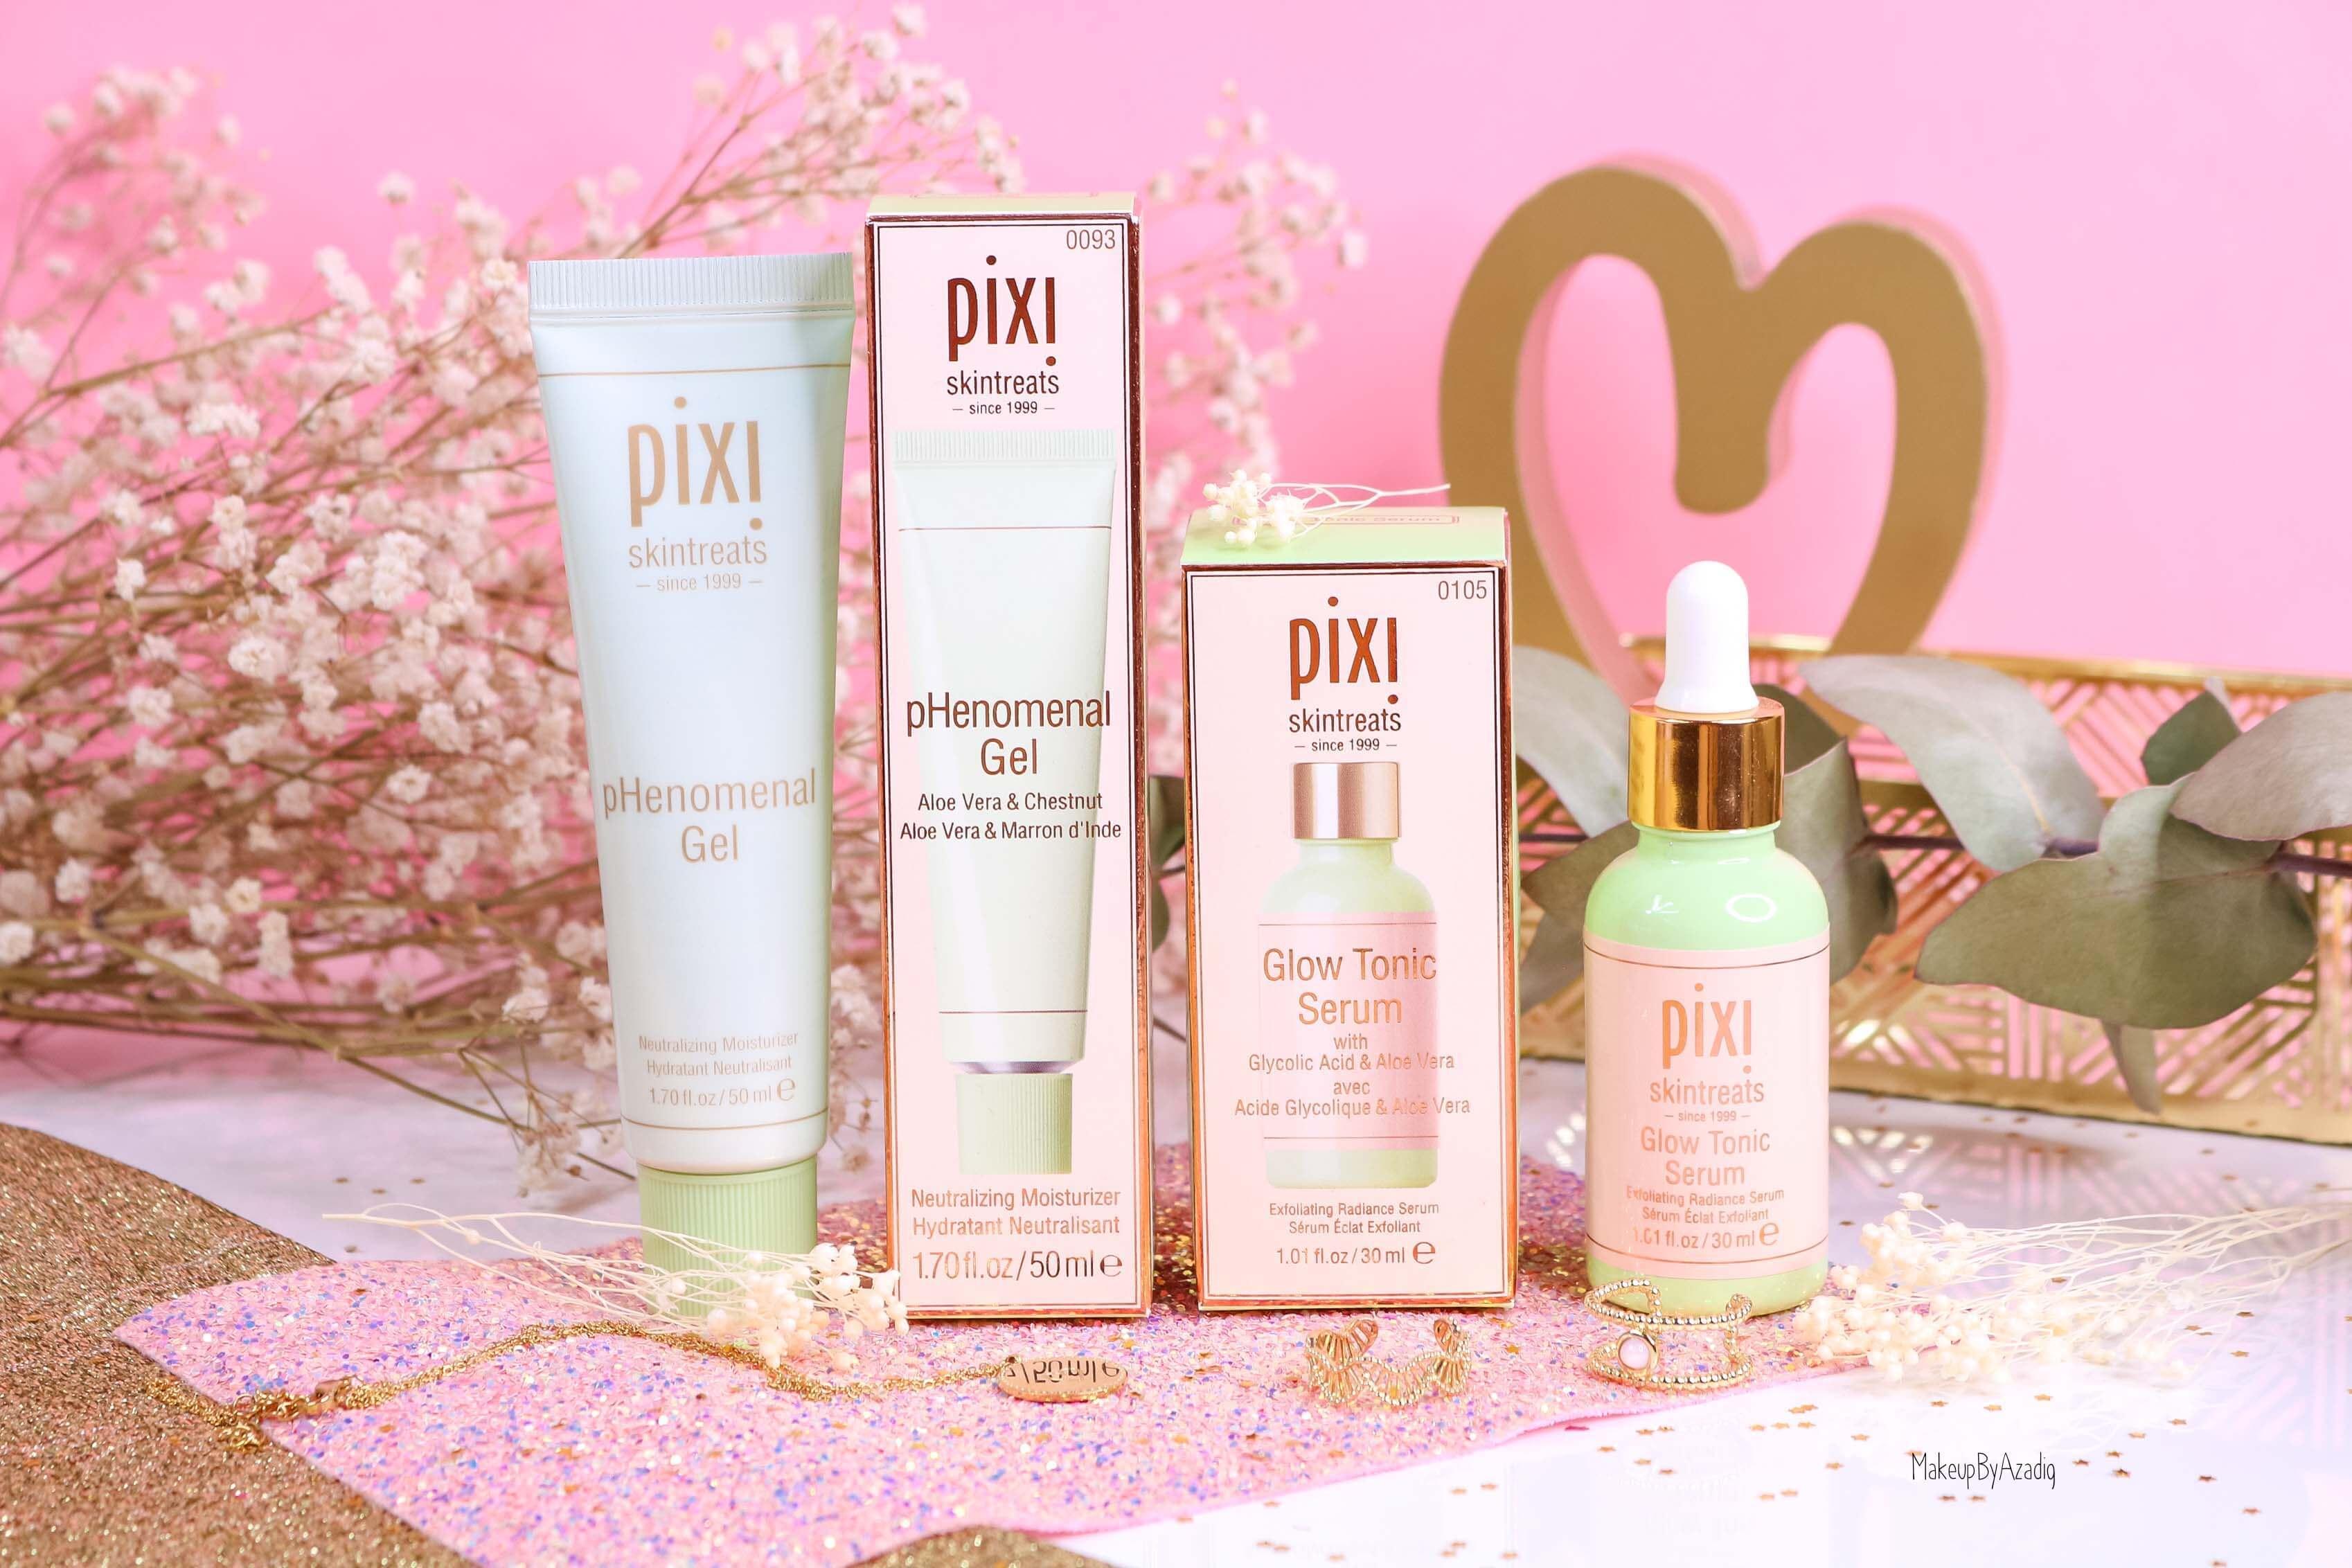 revue-routine-soin-skincare-pixi-beauty-visage-glow-tonic-serum-phenomenal-gel-aloe-vera-makeupbyazadig-sephora-avis-prix-miniature